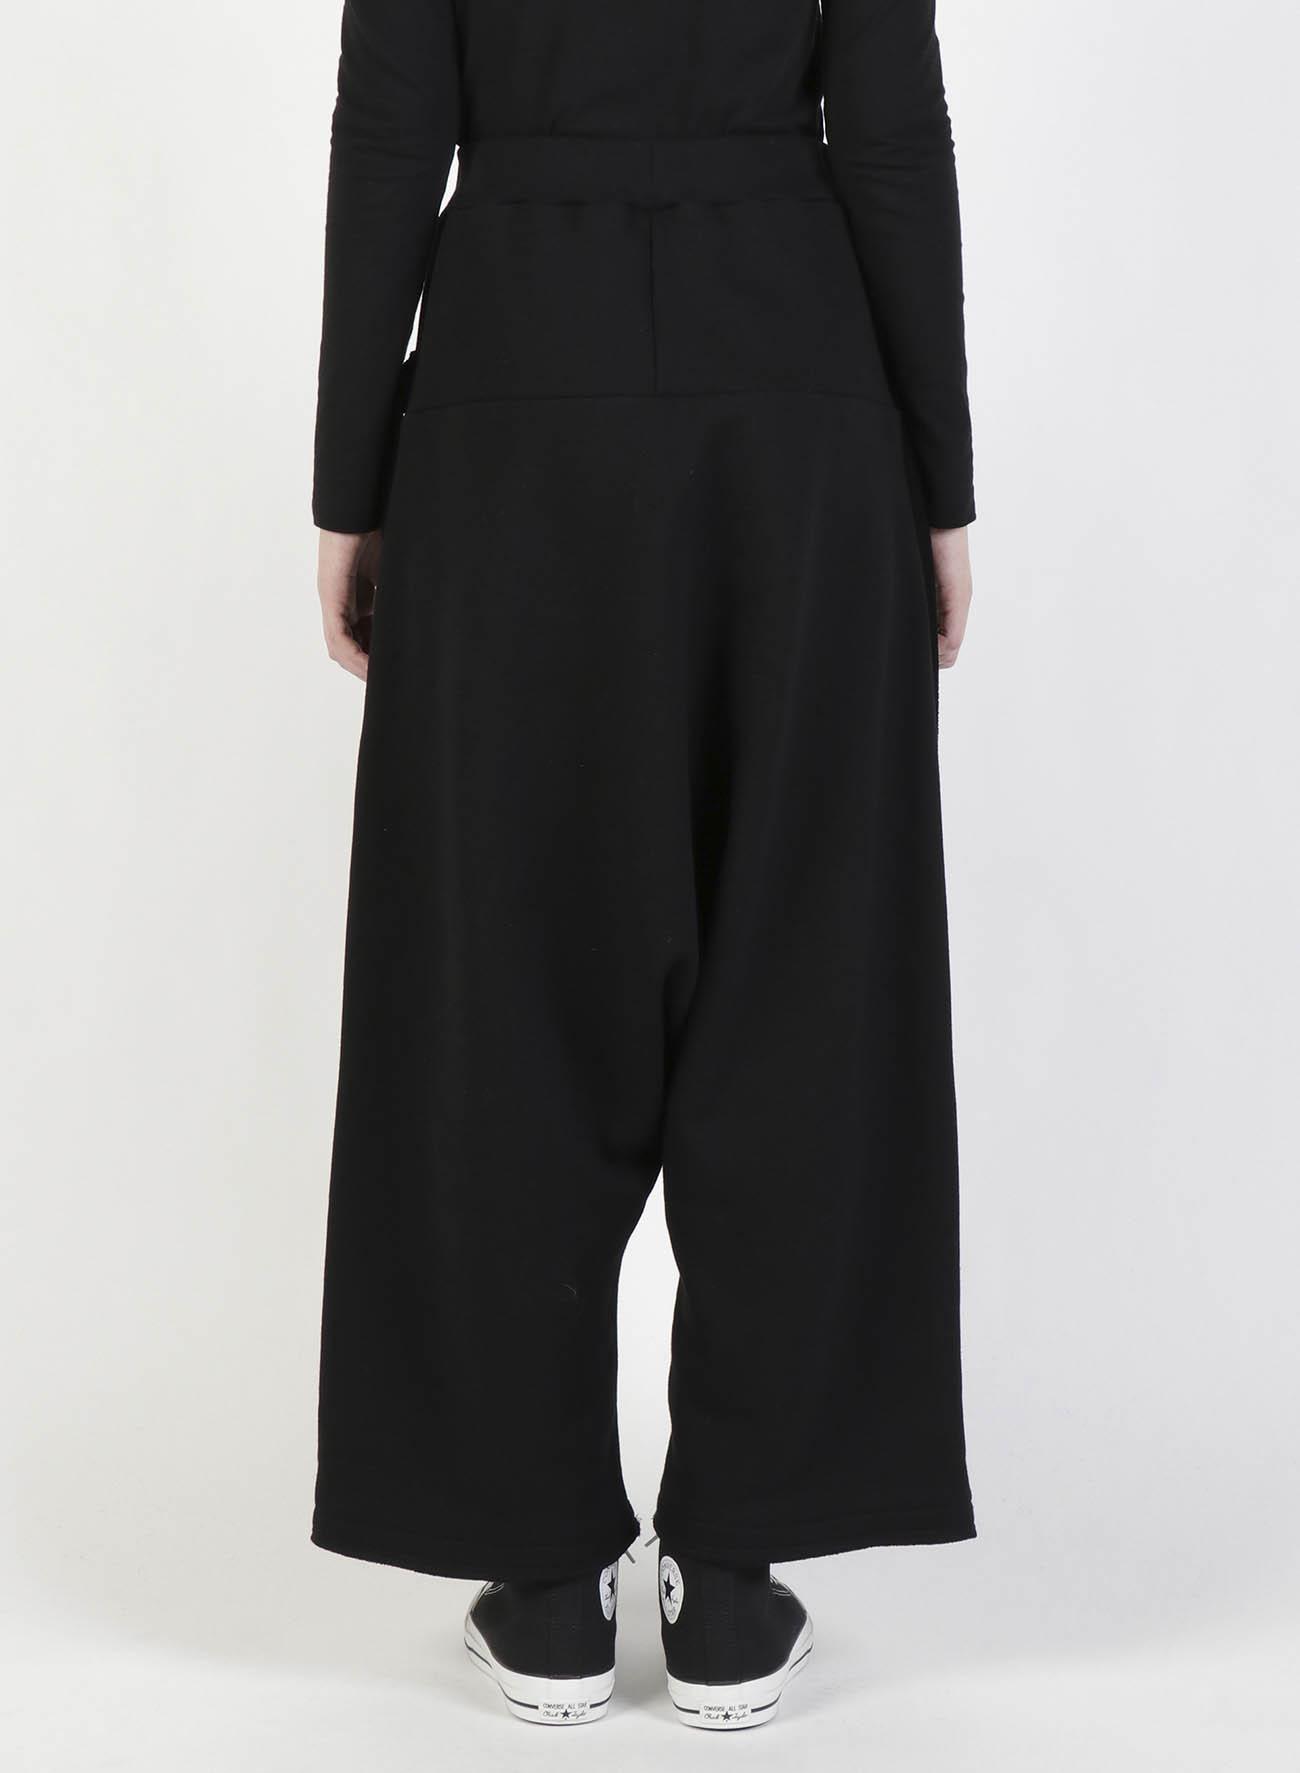 CottoN Mercerized Fleece String Pocket Pants